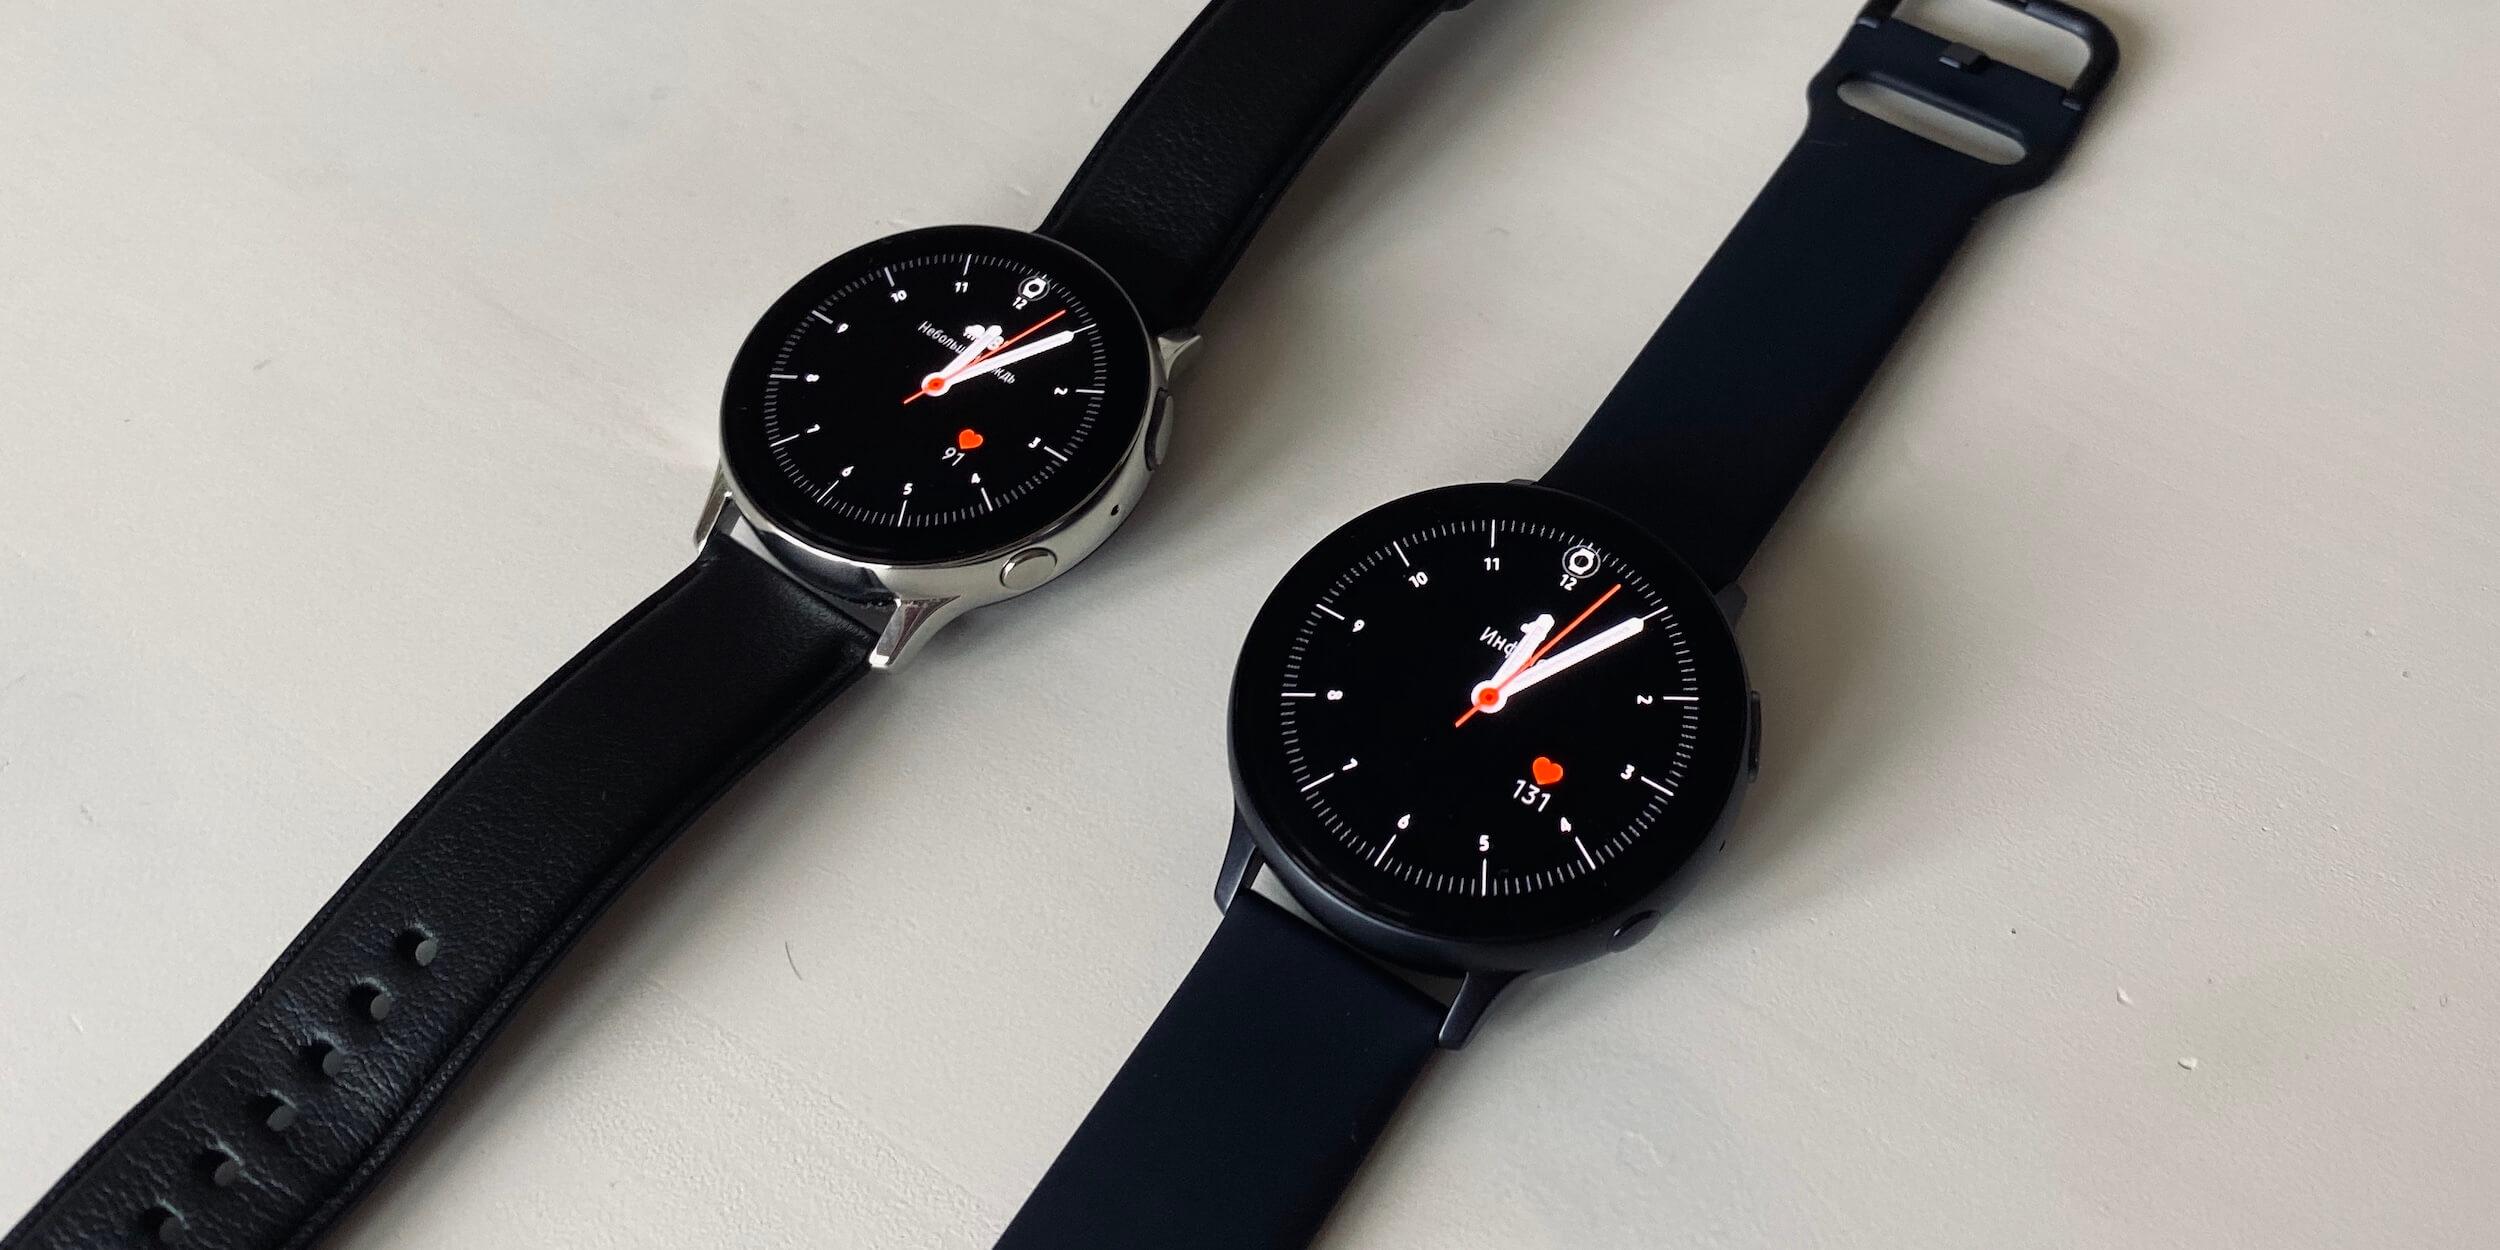 Samsung Galaxy Watch Active 2: ремешки